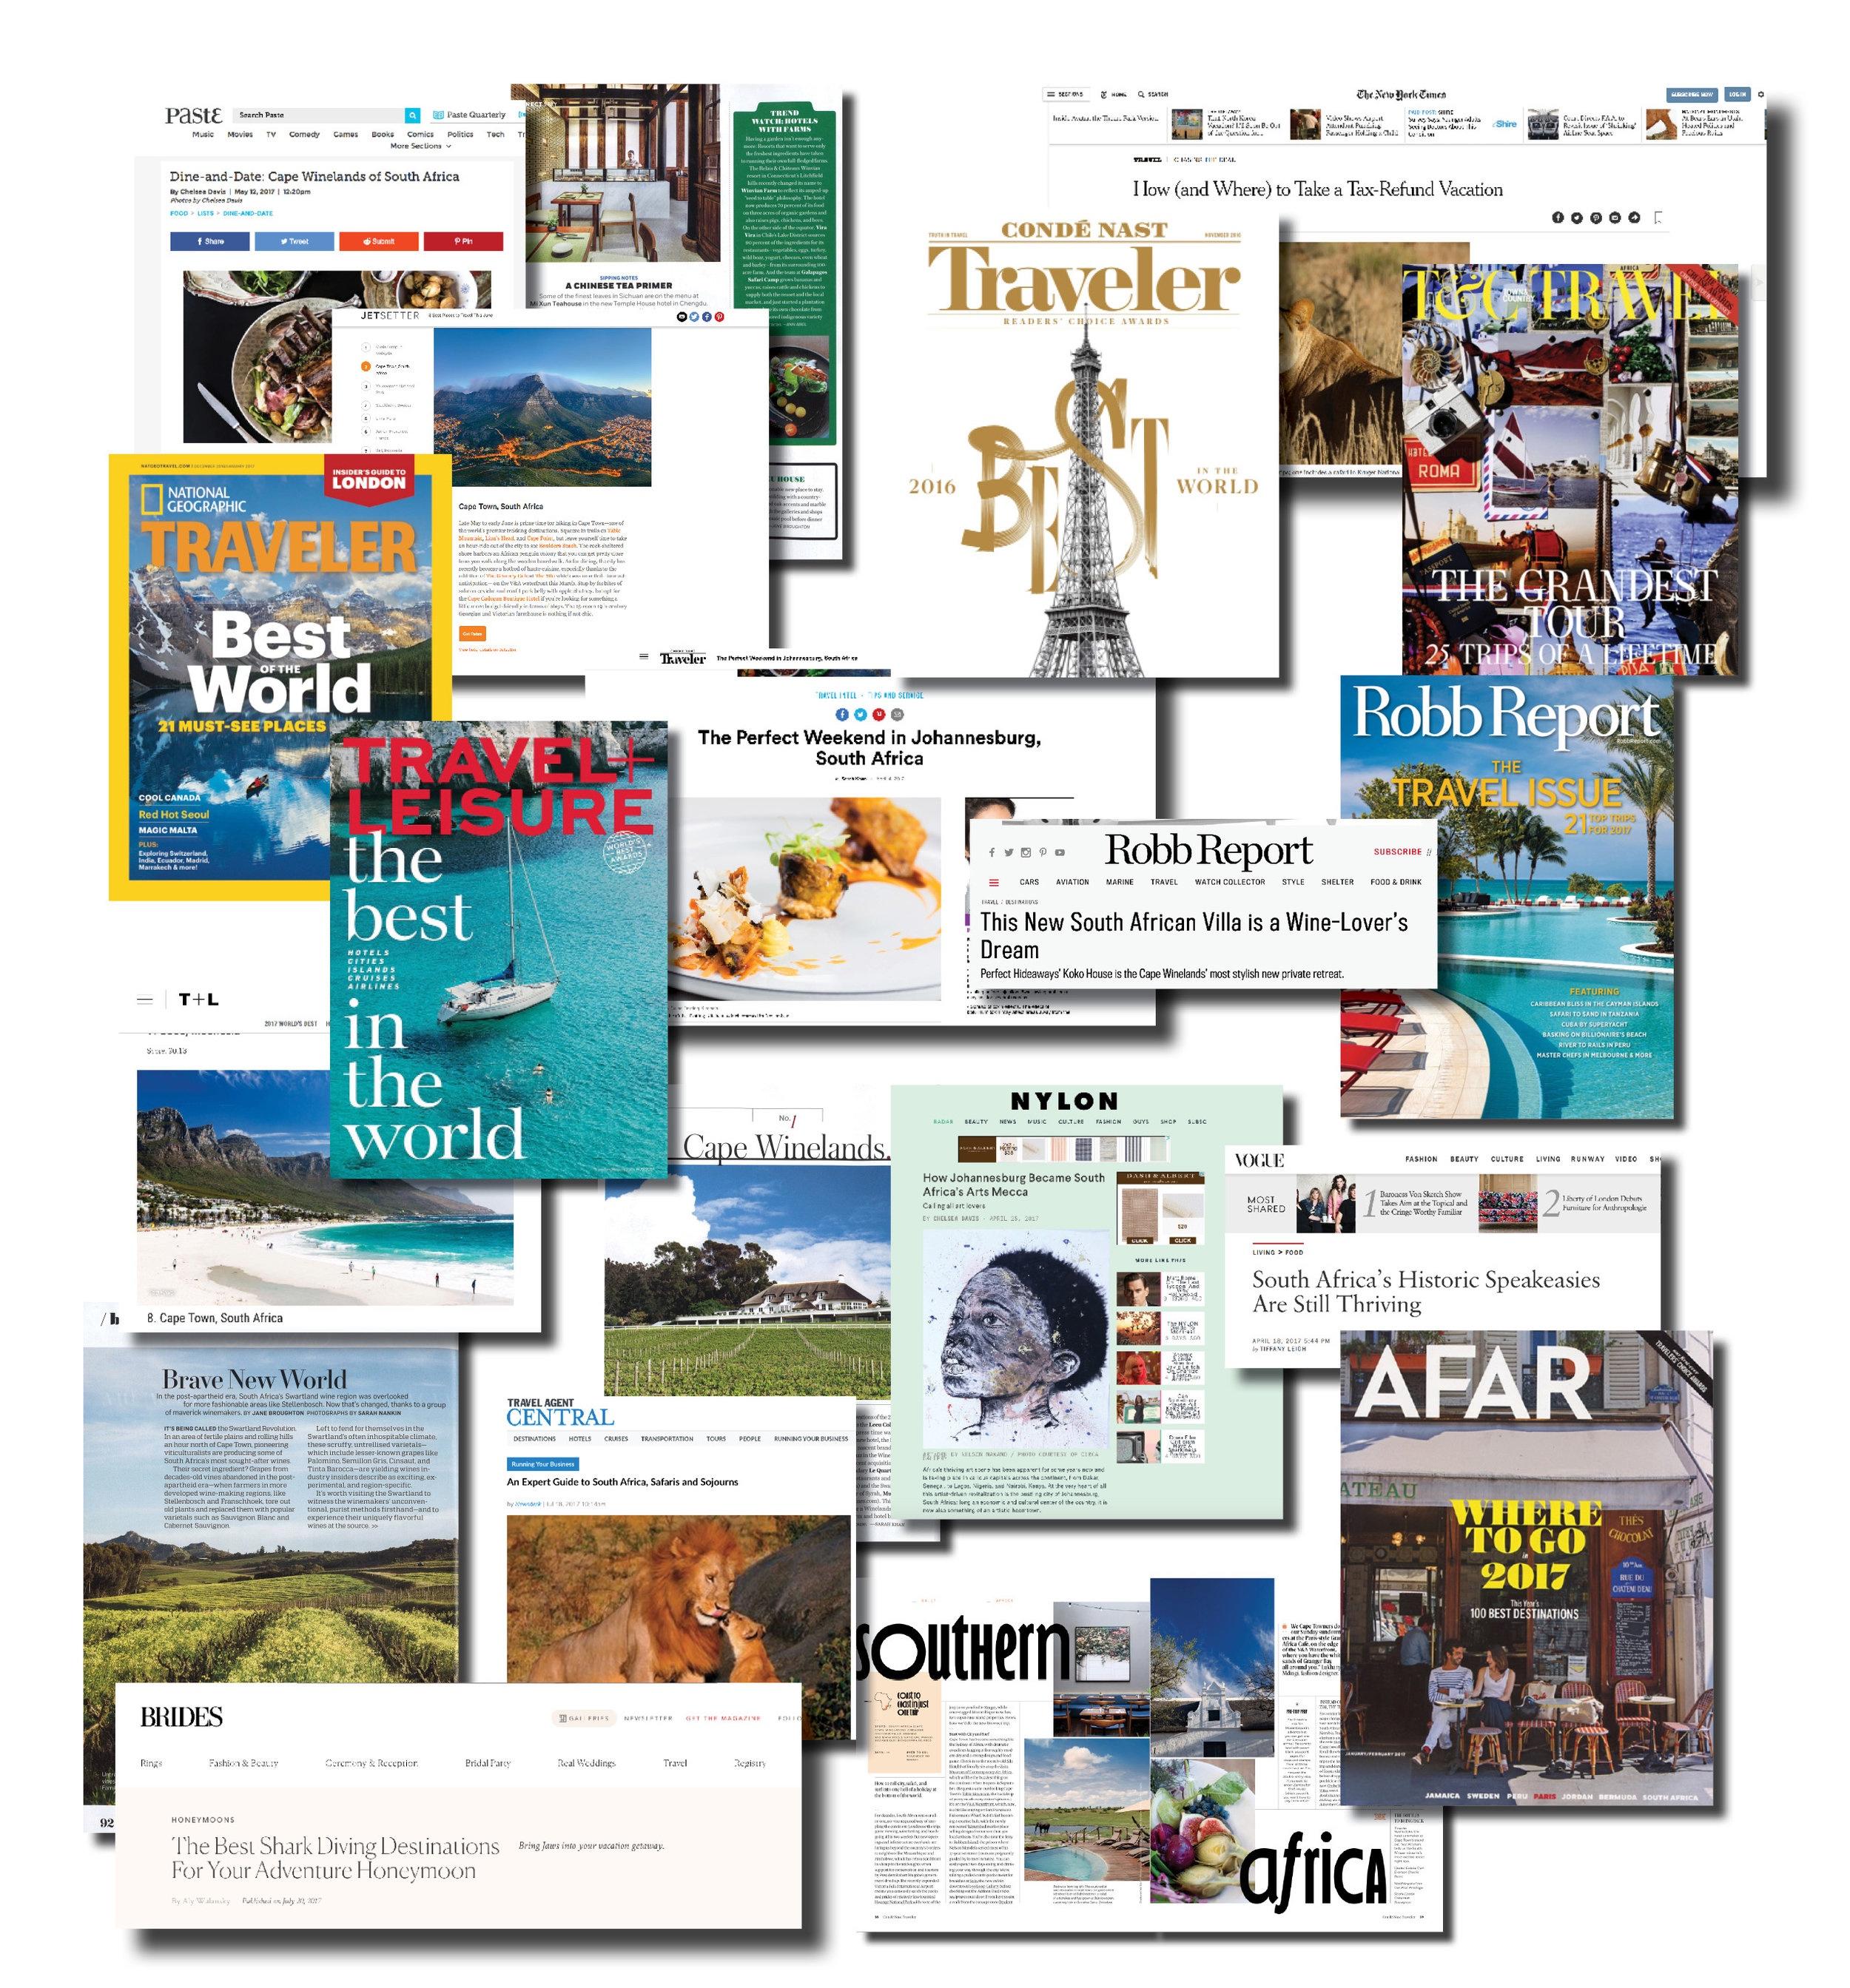 SATB+Consumer+activation+media+coverage.jpg